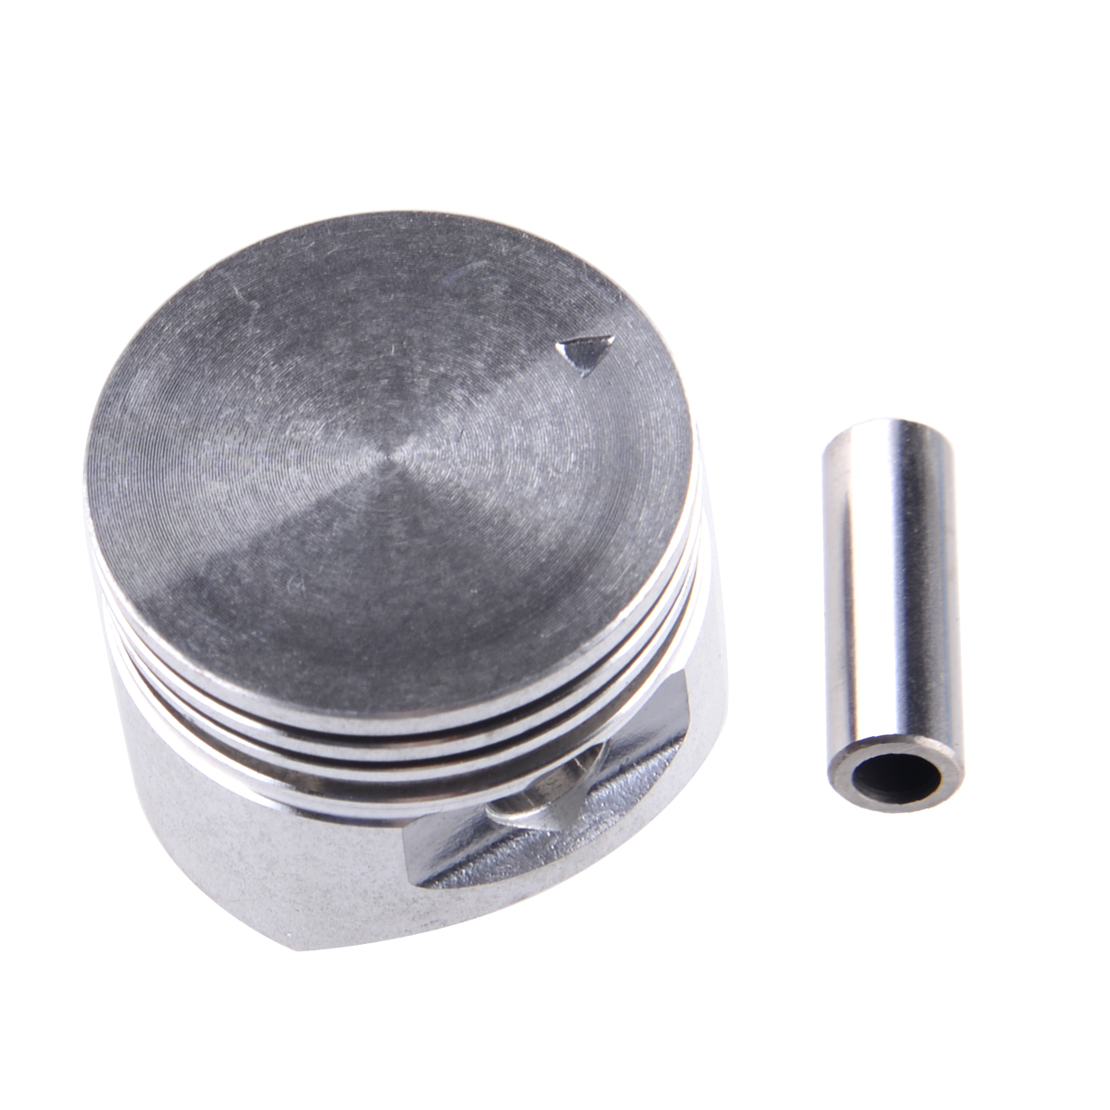 Details about  /Engine Crankshaft Crank Shaft Piston Oil Seal Gaskets Kit Fit for Honda GX25